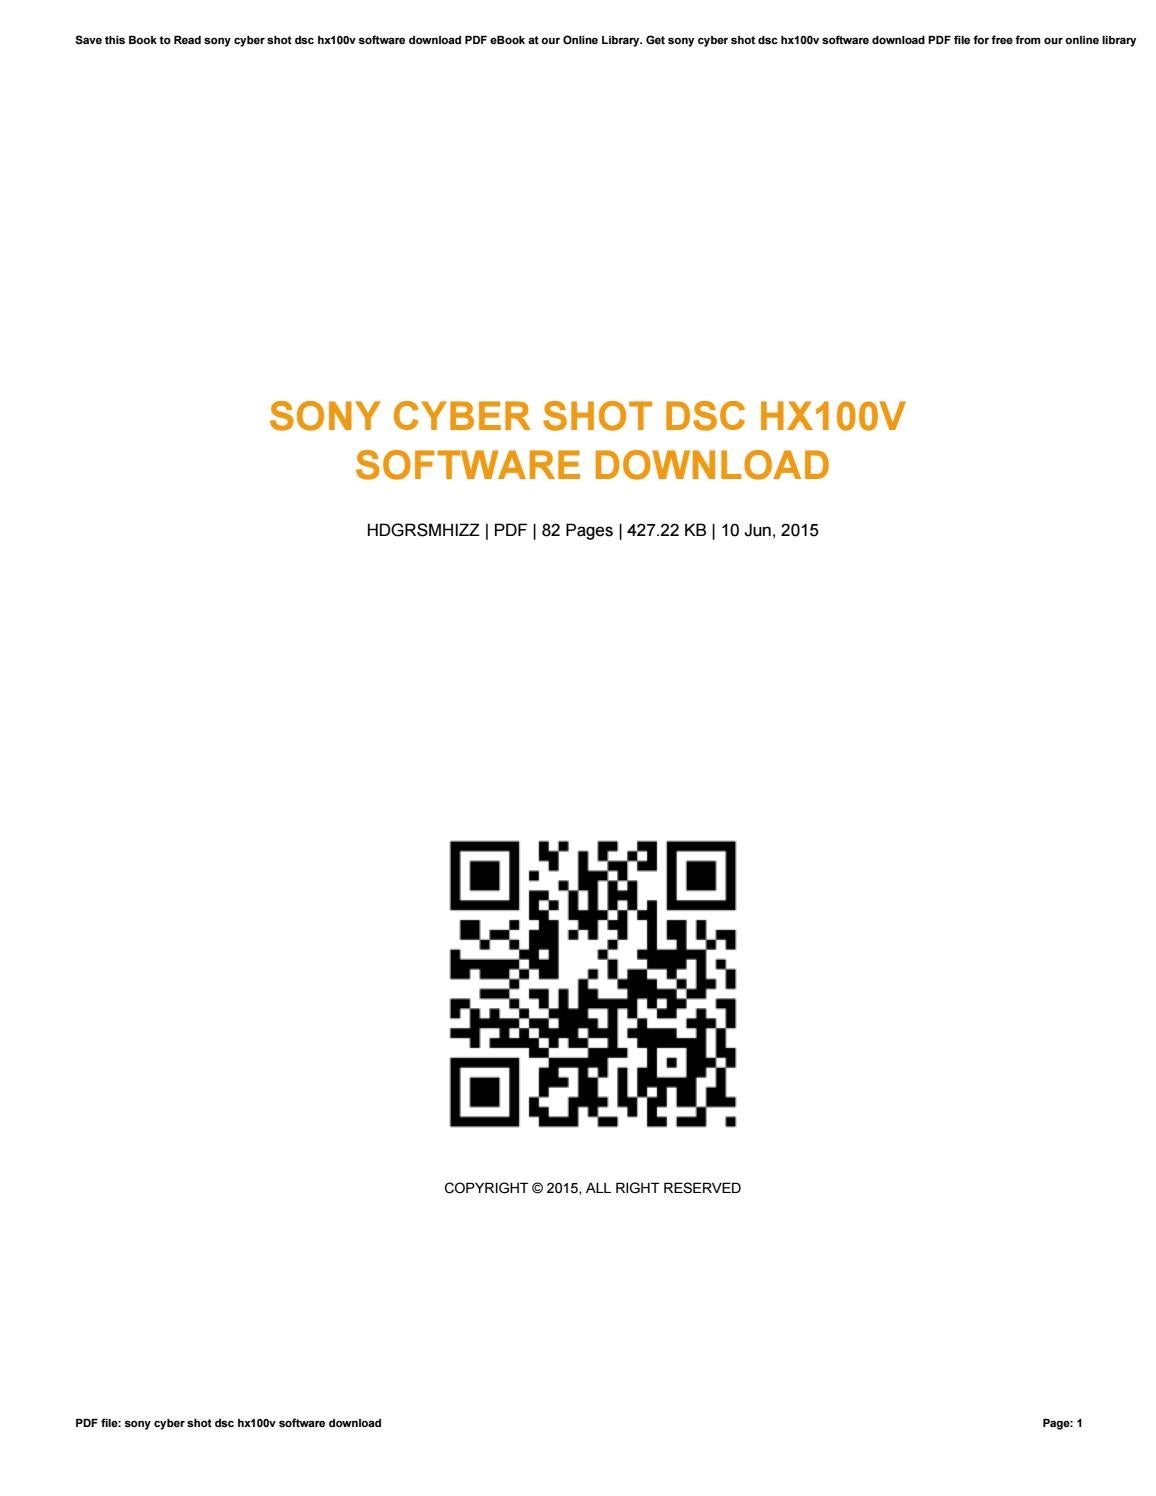 Sony cyber shot dsc l1 drivere download opdater sony software.